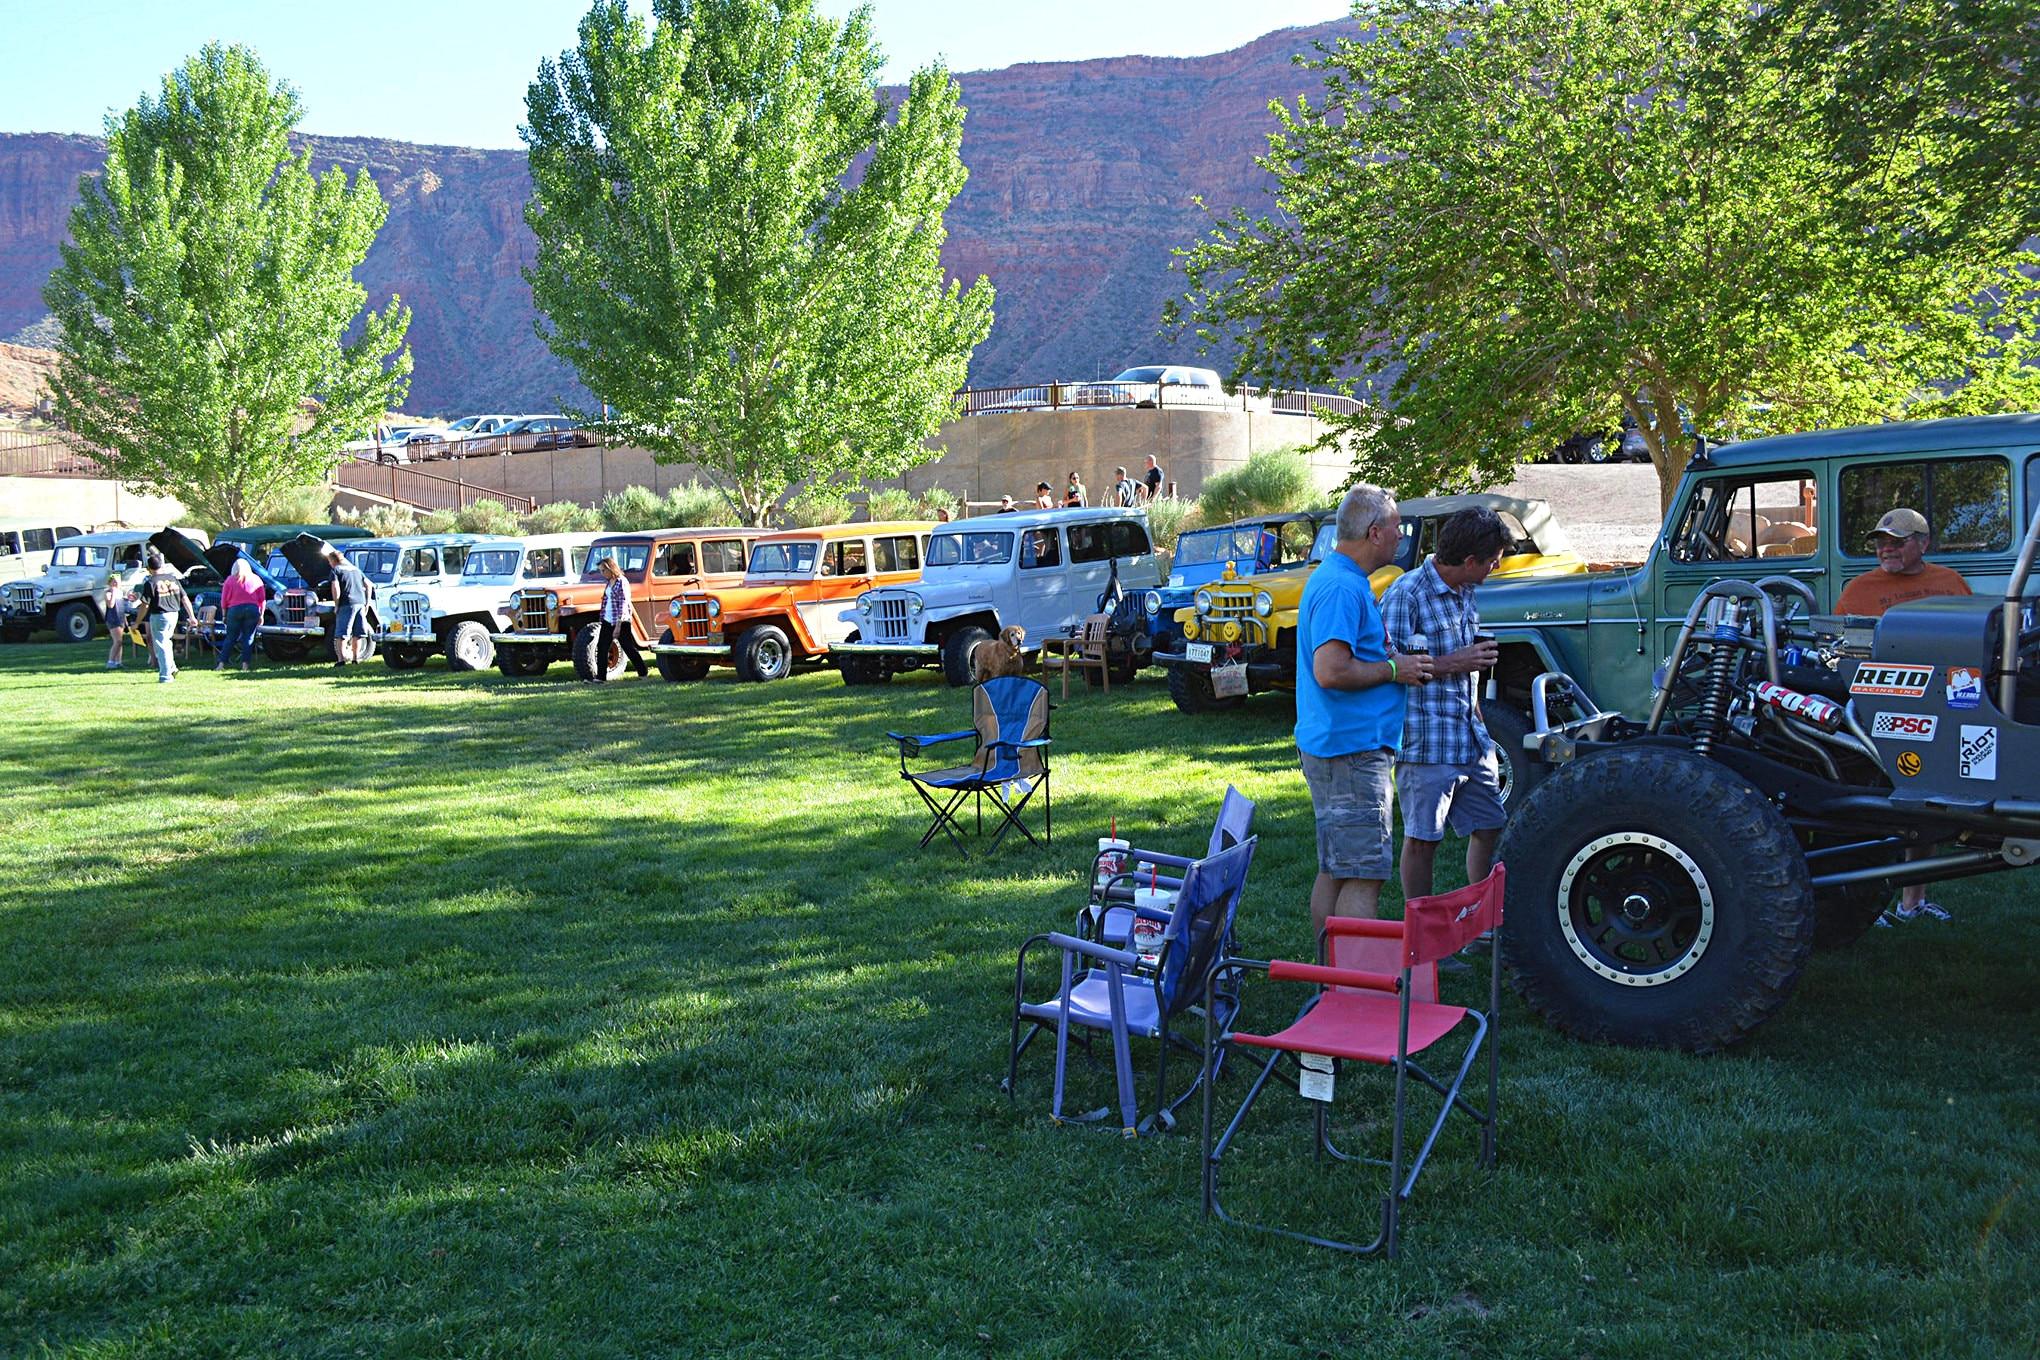 023 willys rally moab 2018 gallery.JPG